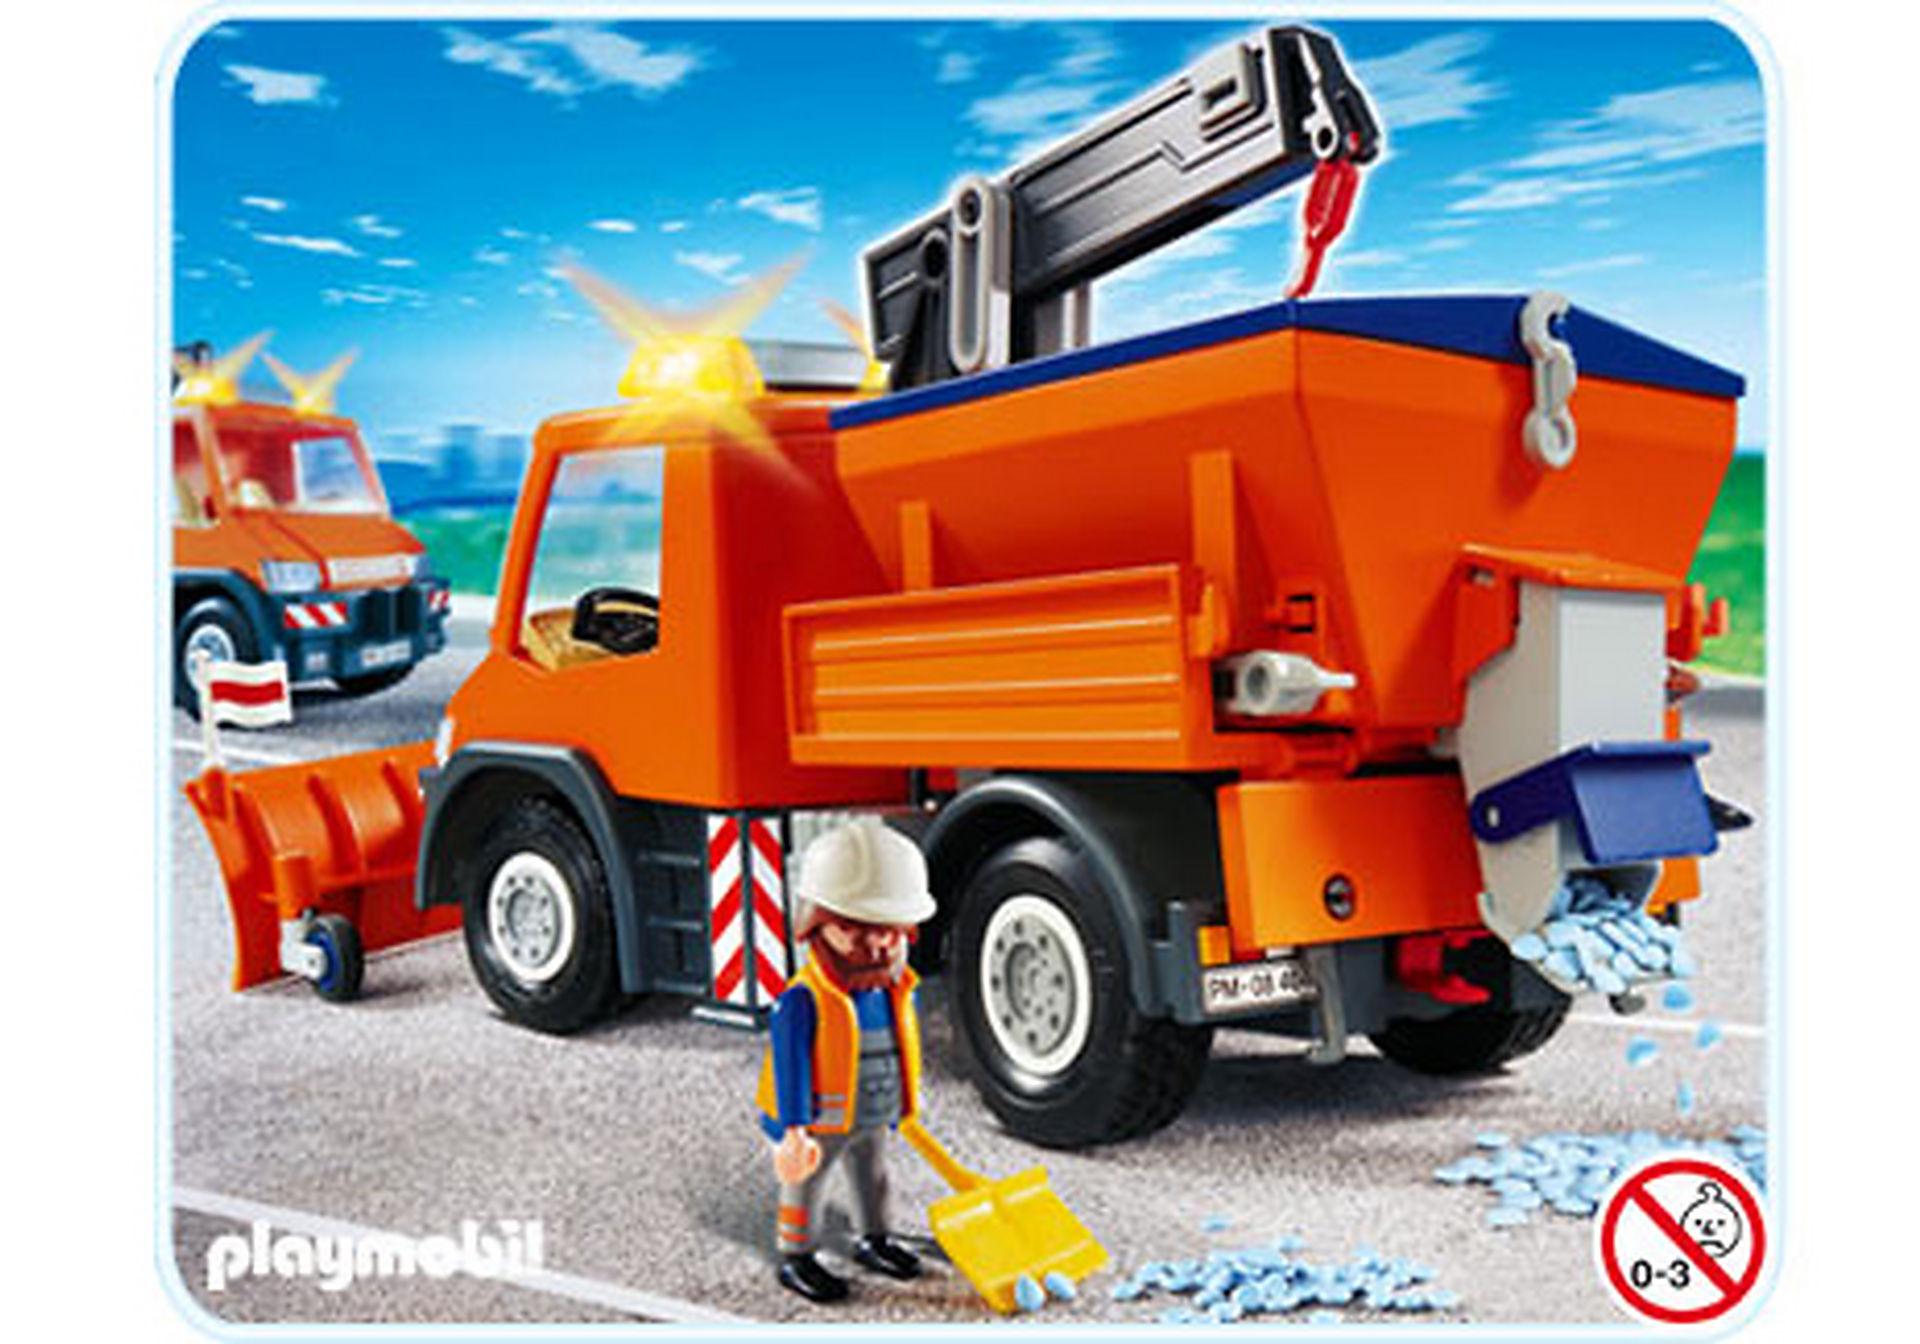 http://media.playmobil.com/i/playmobil/4046-A_product_detail/Straßenmeisterei-Fahrzeug